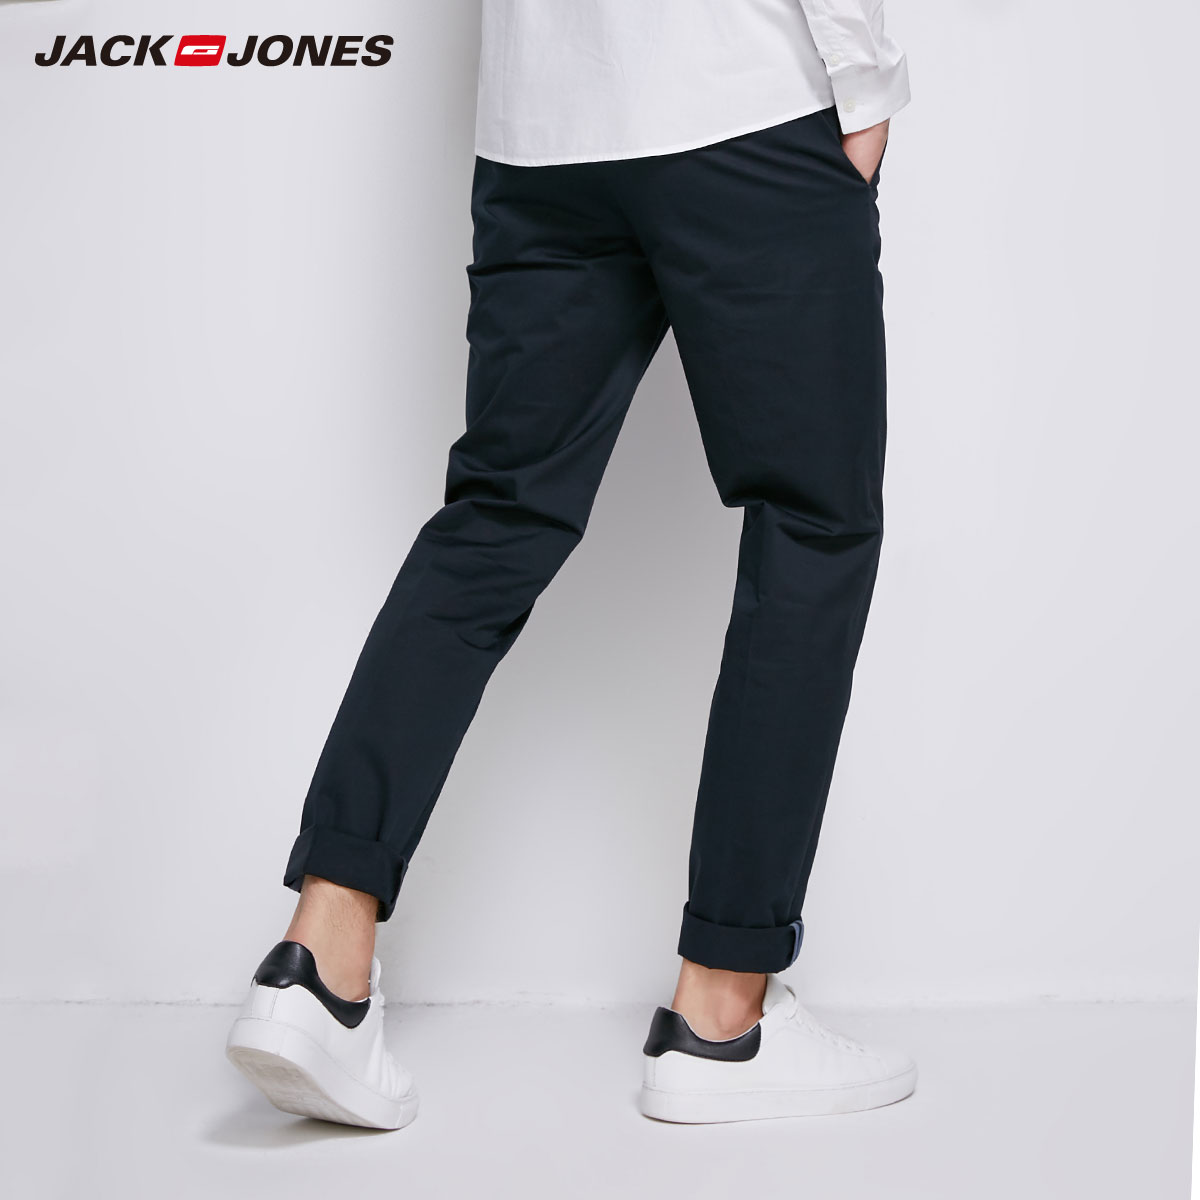 Image 2 - JackJones Mens Cotton Pants Elastic Fabric Comfort Breathable  Business Smart Casual Pants Slim Fit Trousers Menswear218314502Casual  Pants